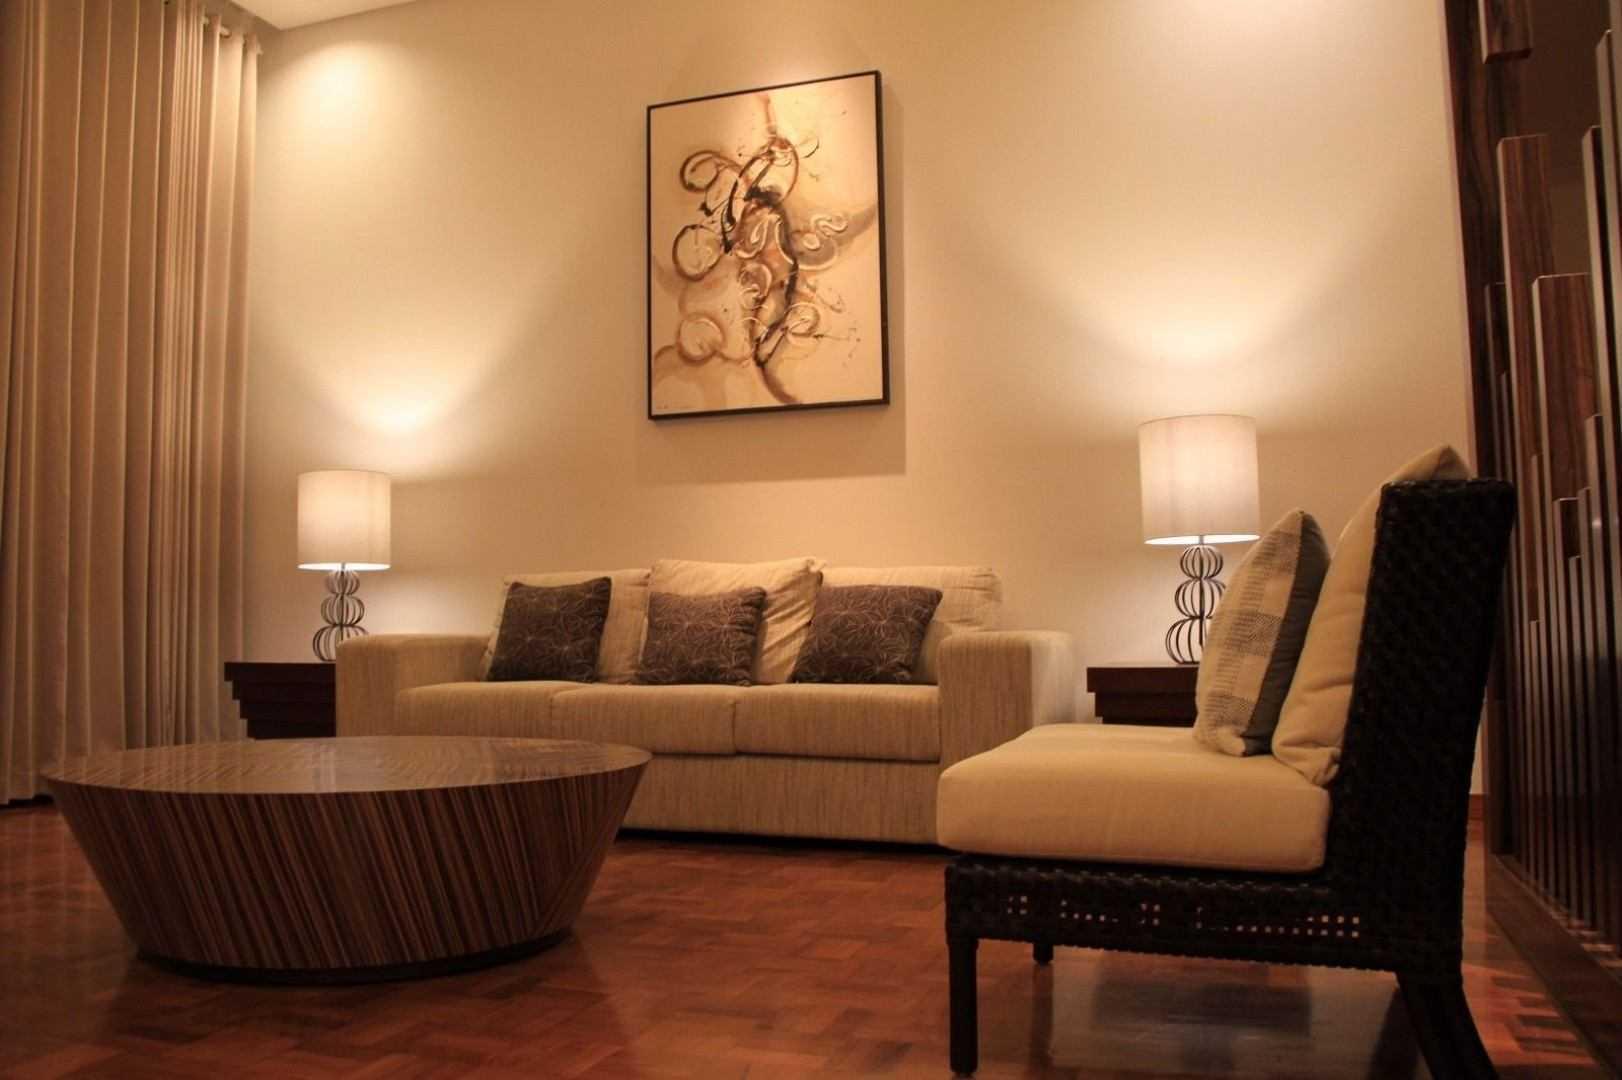 Kottagaris Interior Design Consultant Villa At Blitar City East Java Blitar, Jawa Timur, Indonesia Blitar, Jawa Timur, Indonesia Living Room  54627